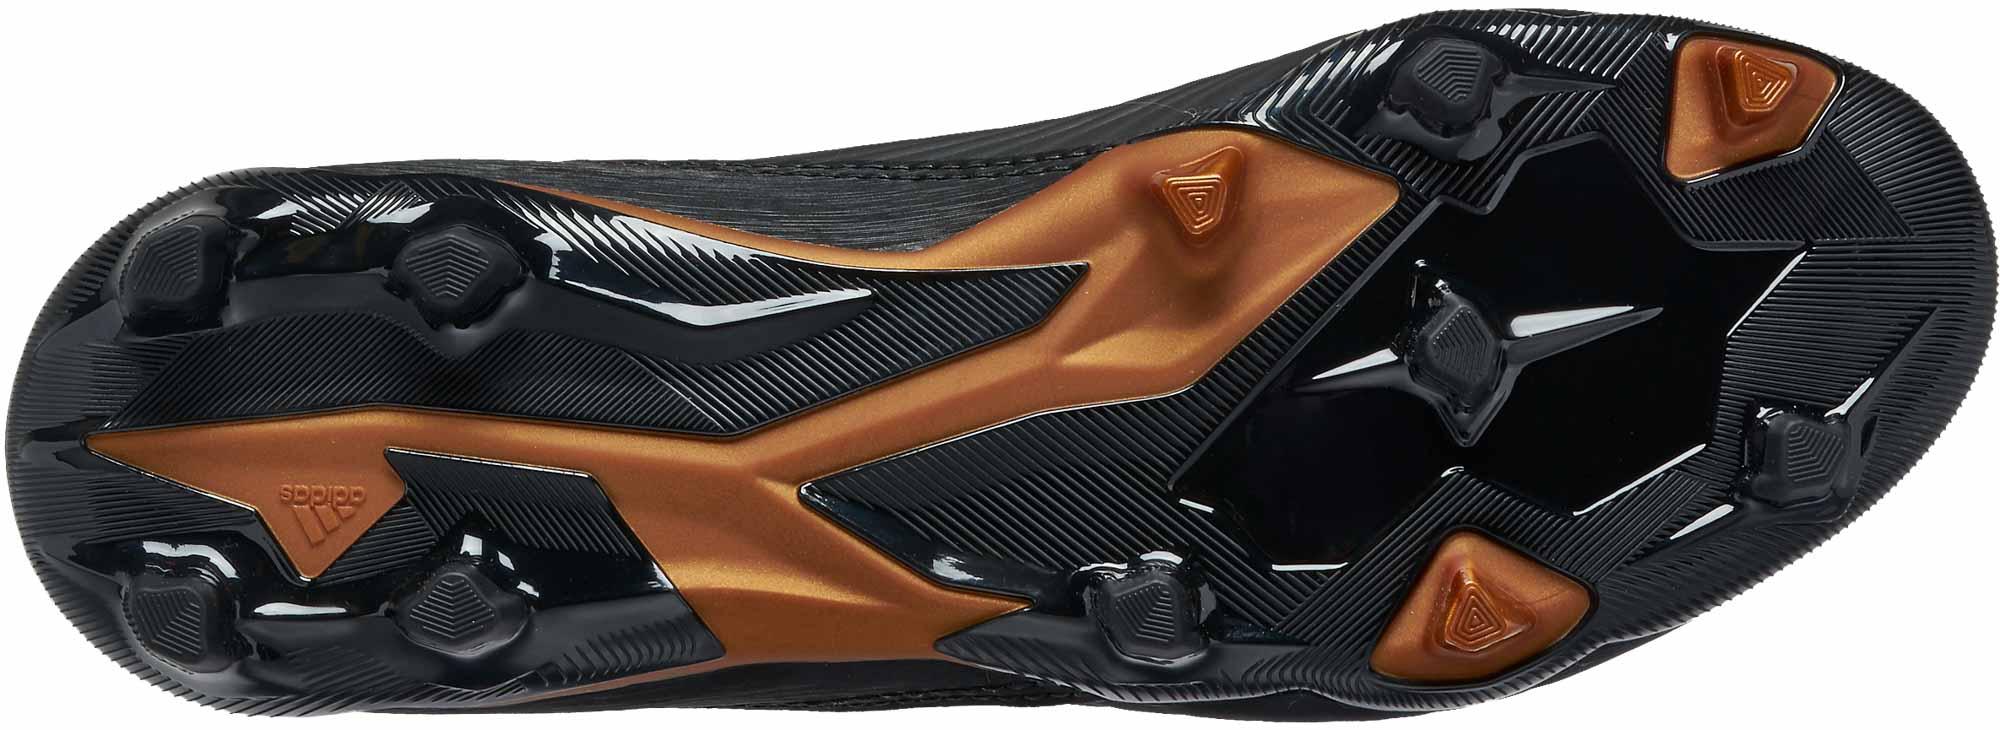 Adidas Predator Bitte 18,3